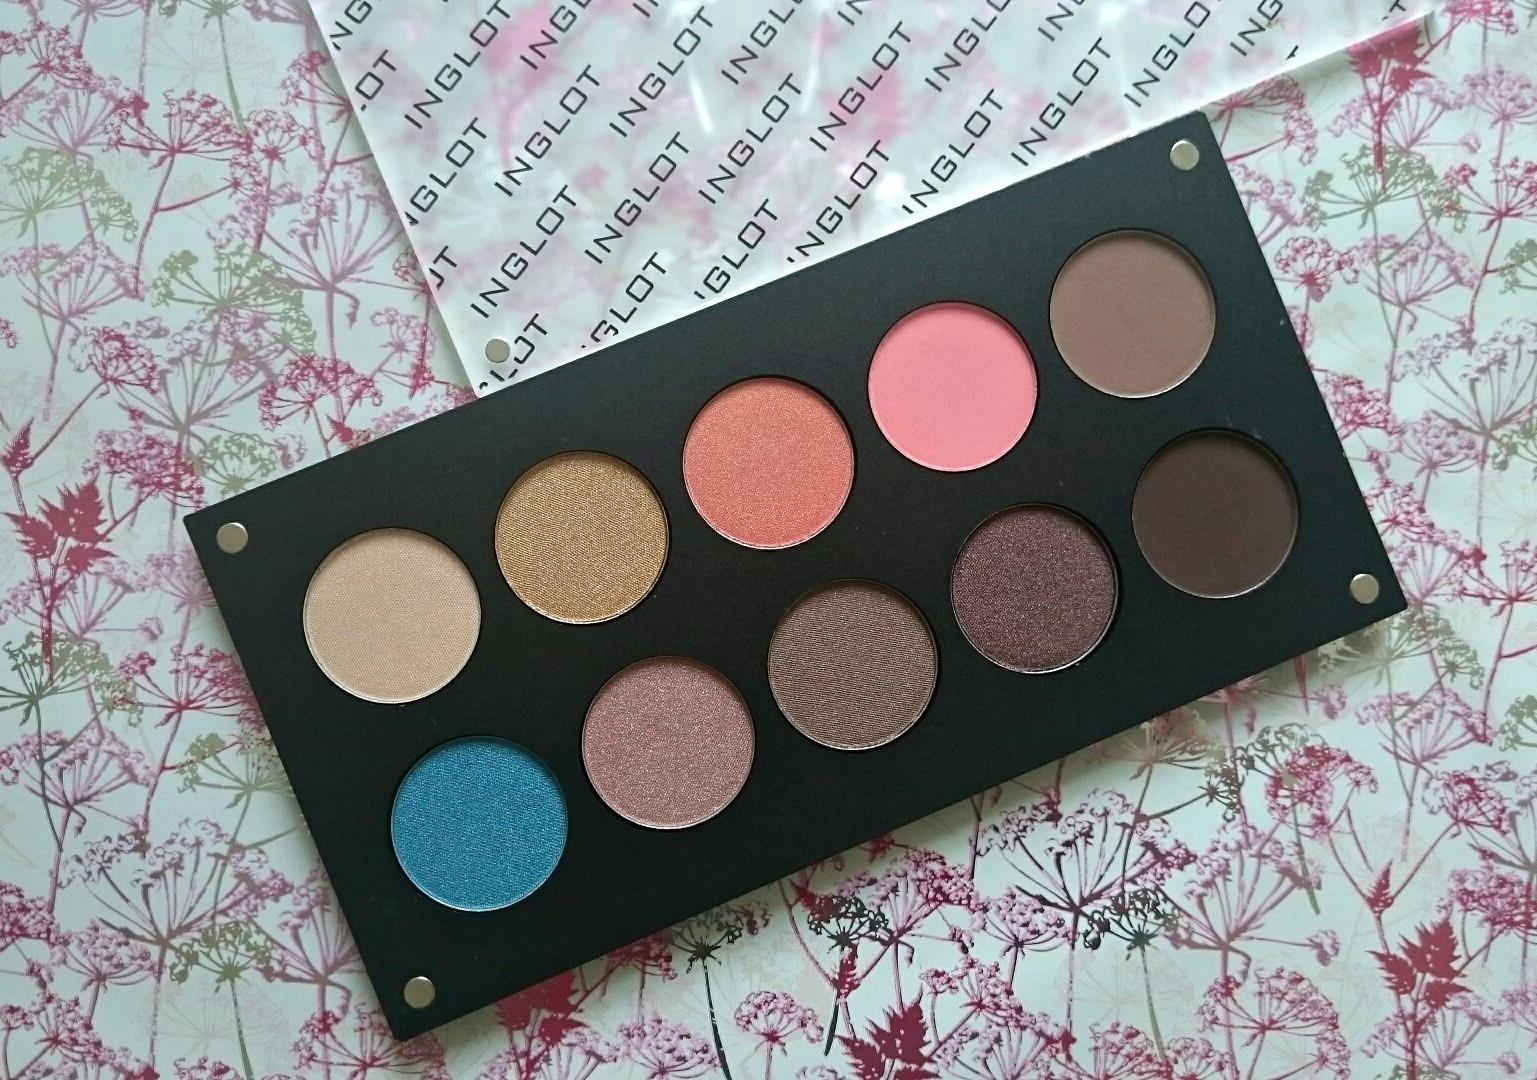 Inglot eyeshadow palette